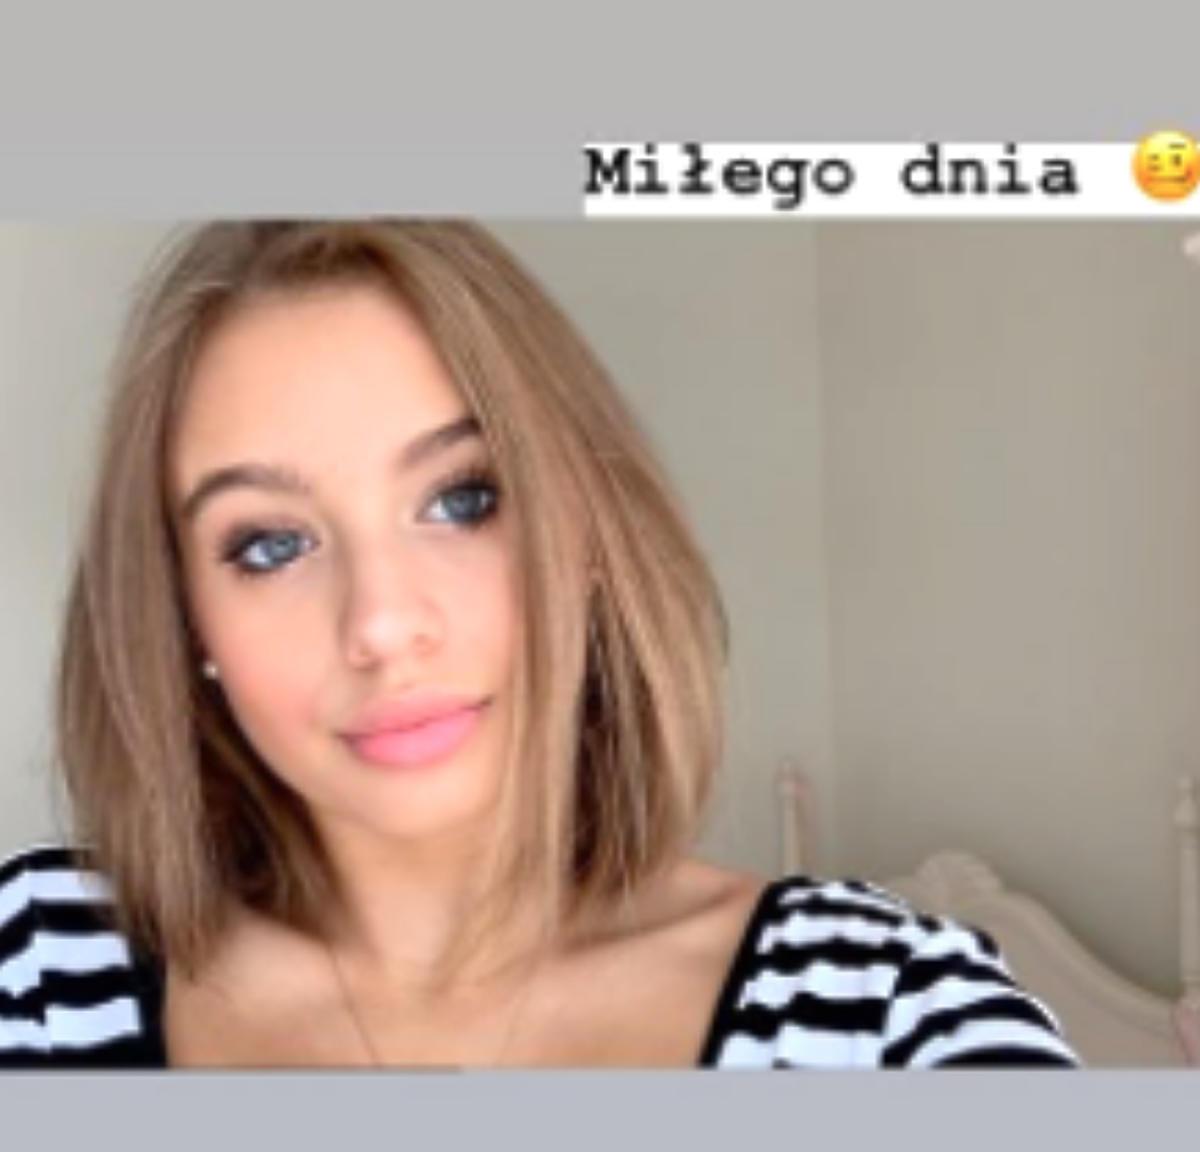 Oliwia Bieniuk Instagram